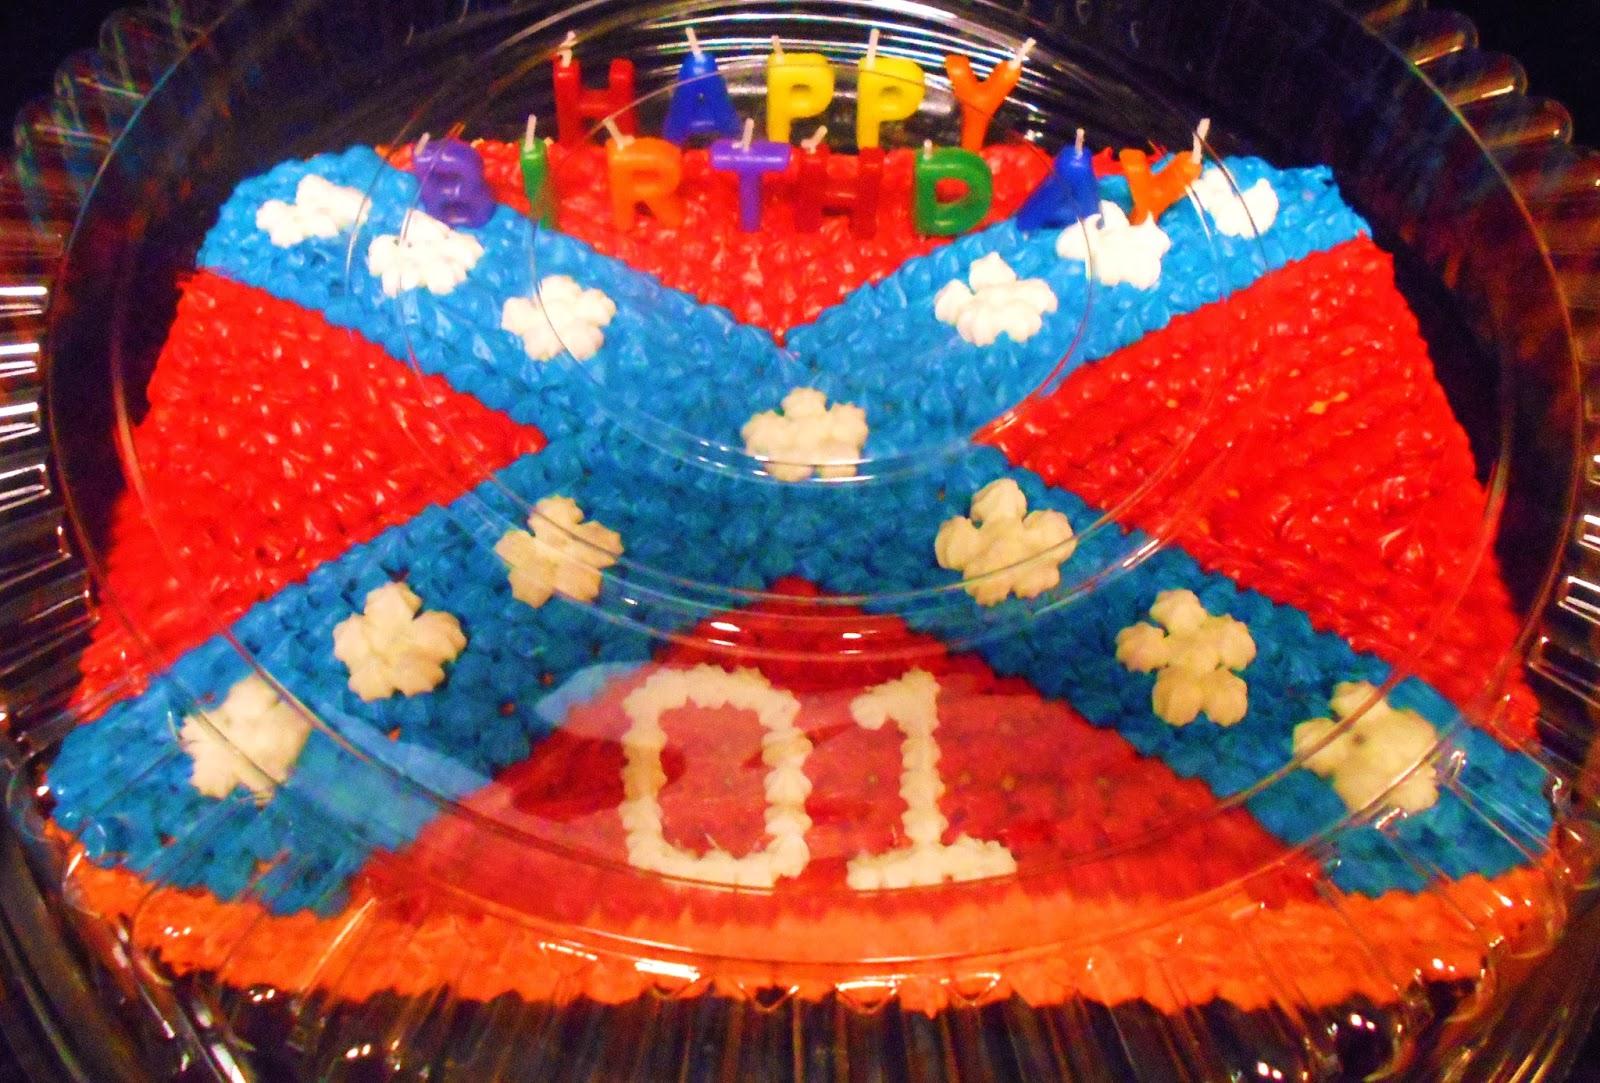 Homespun Fun On Ridgewood Save Cash Ola On Birthdays Make The Cake